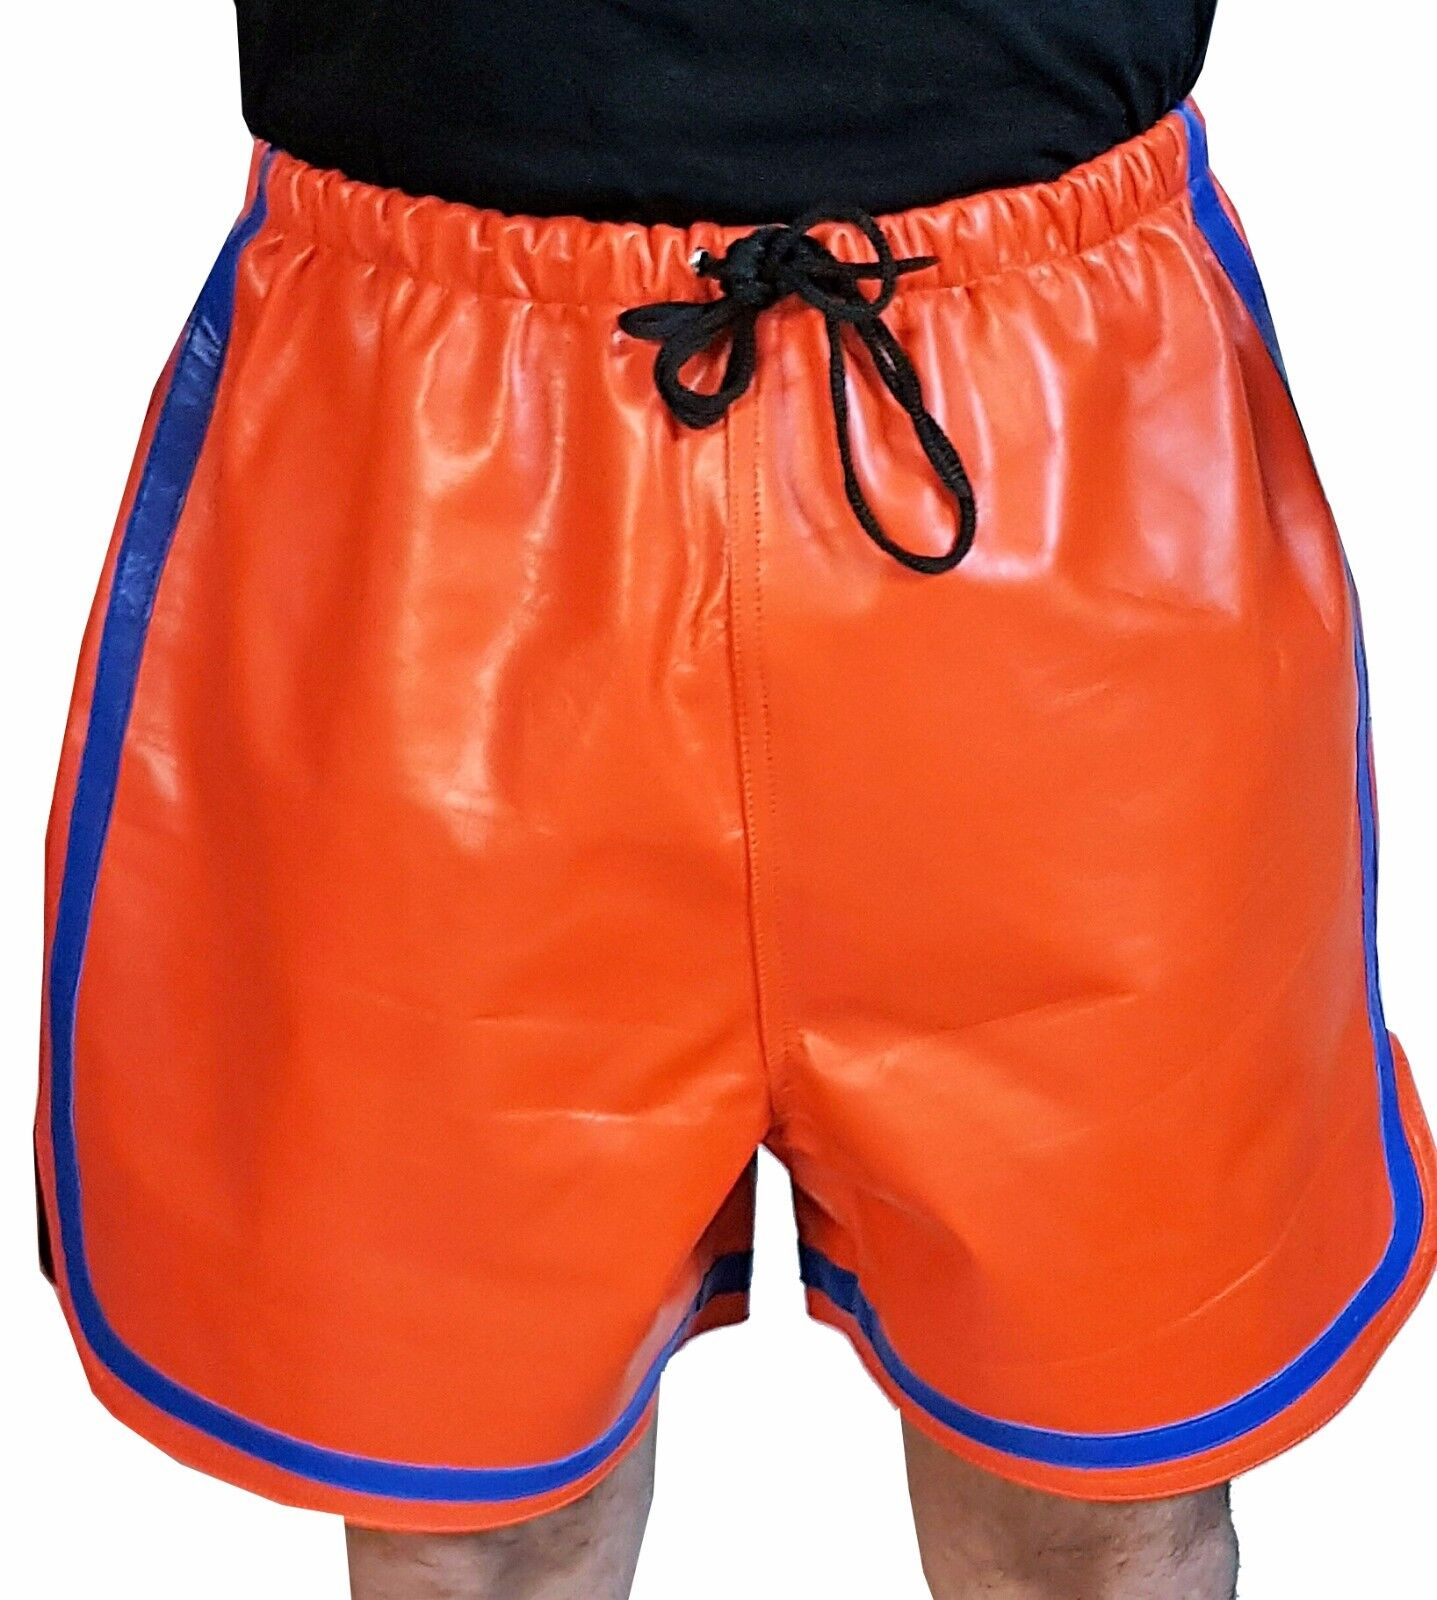 Leder Short mit Gummizug aus Lamm Nappa Größe MLXL2XL3XL